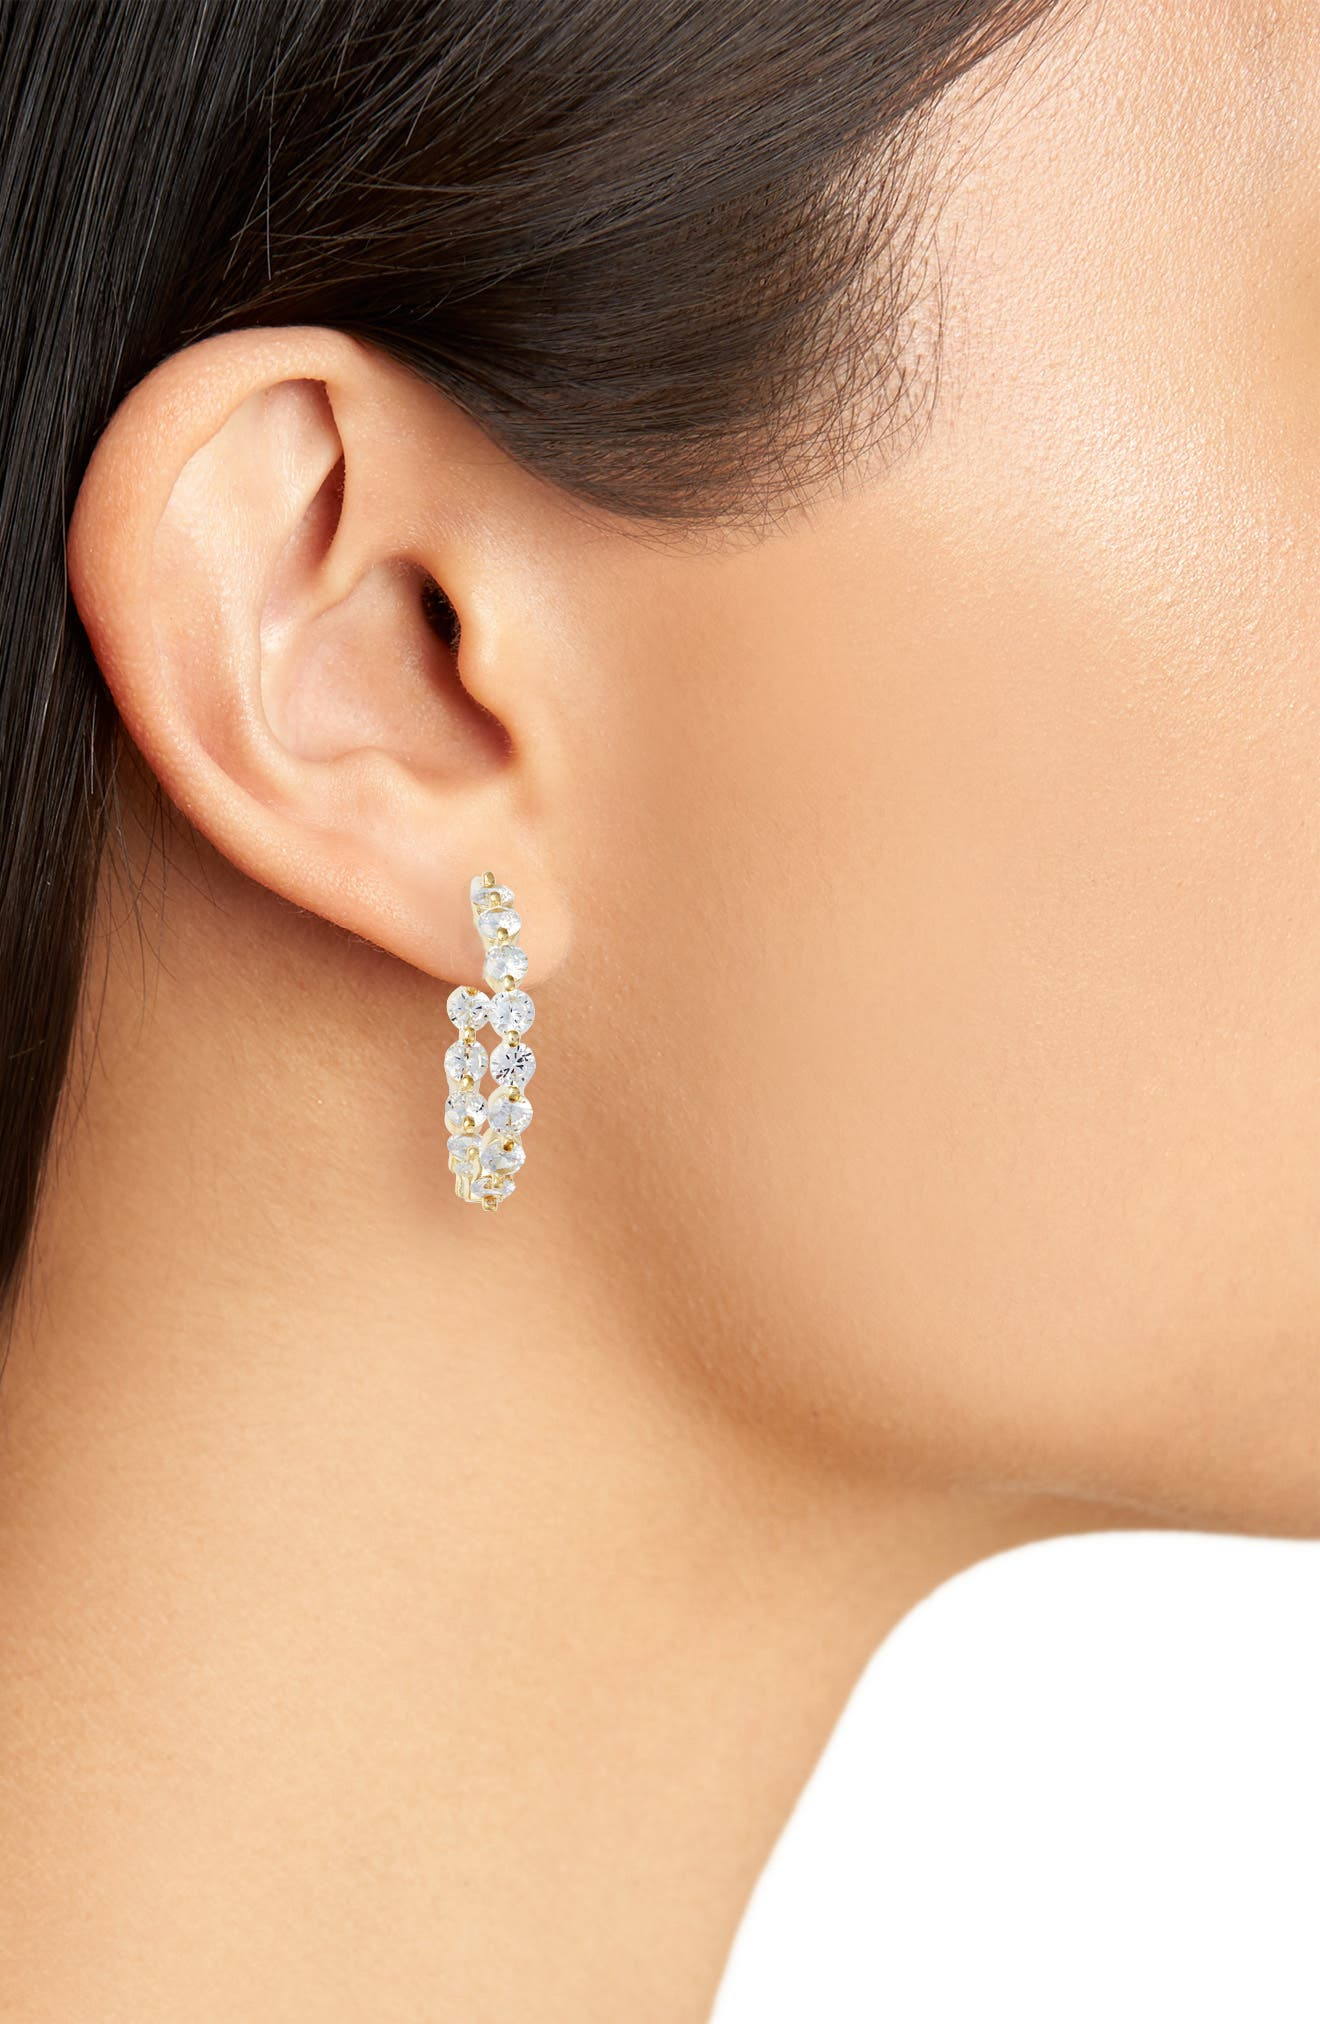 Medium Cubic Zirconia Hoop Earrings,                             Alternate thumbnail 2, color,                             Gold/ White Cz